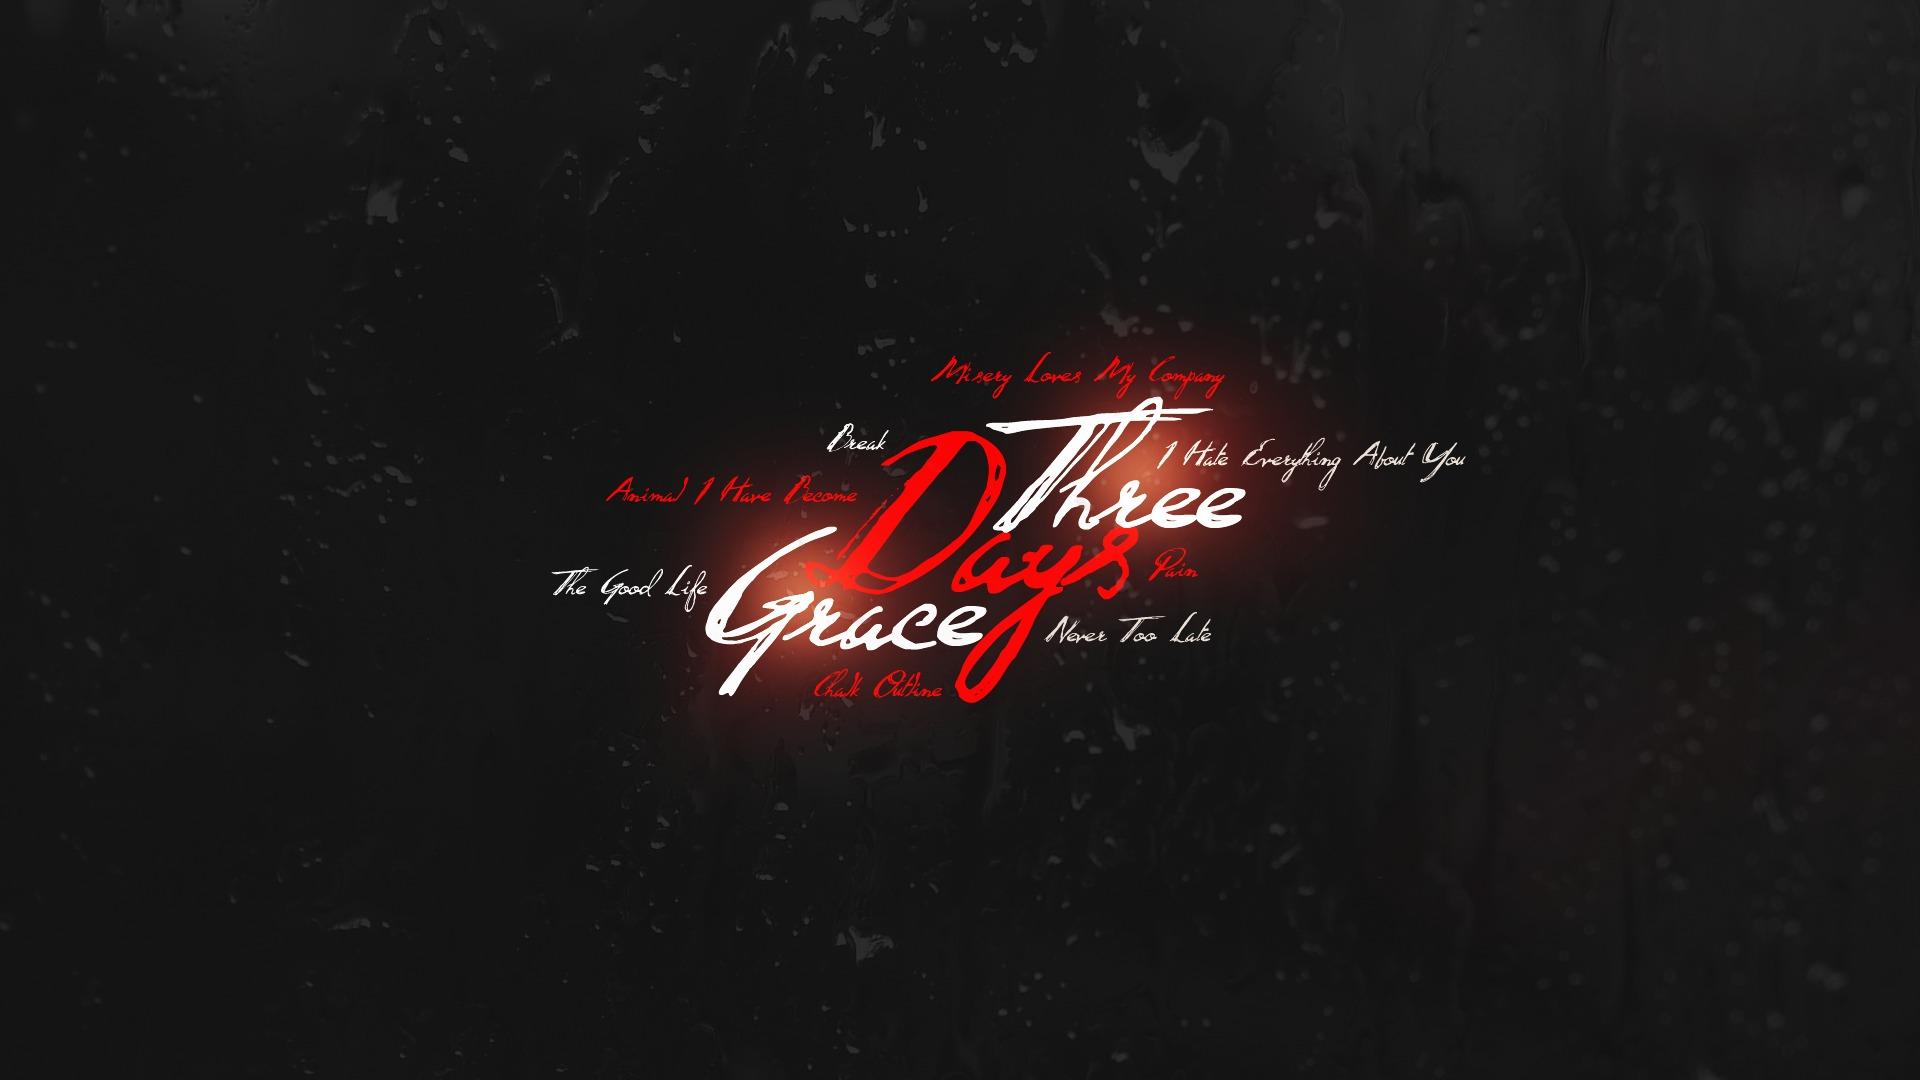 Wallpaper text logo brand three days grace darkness - Three days grace wallpaper ...